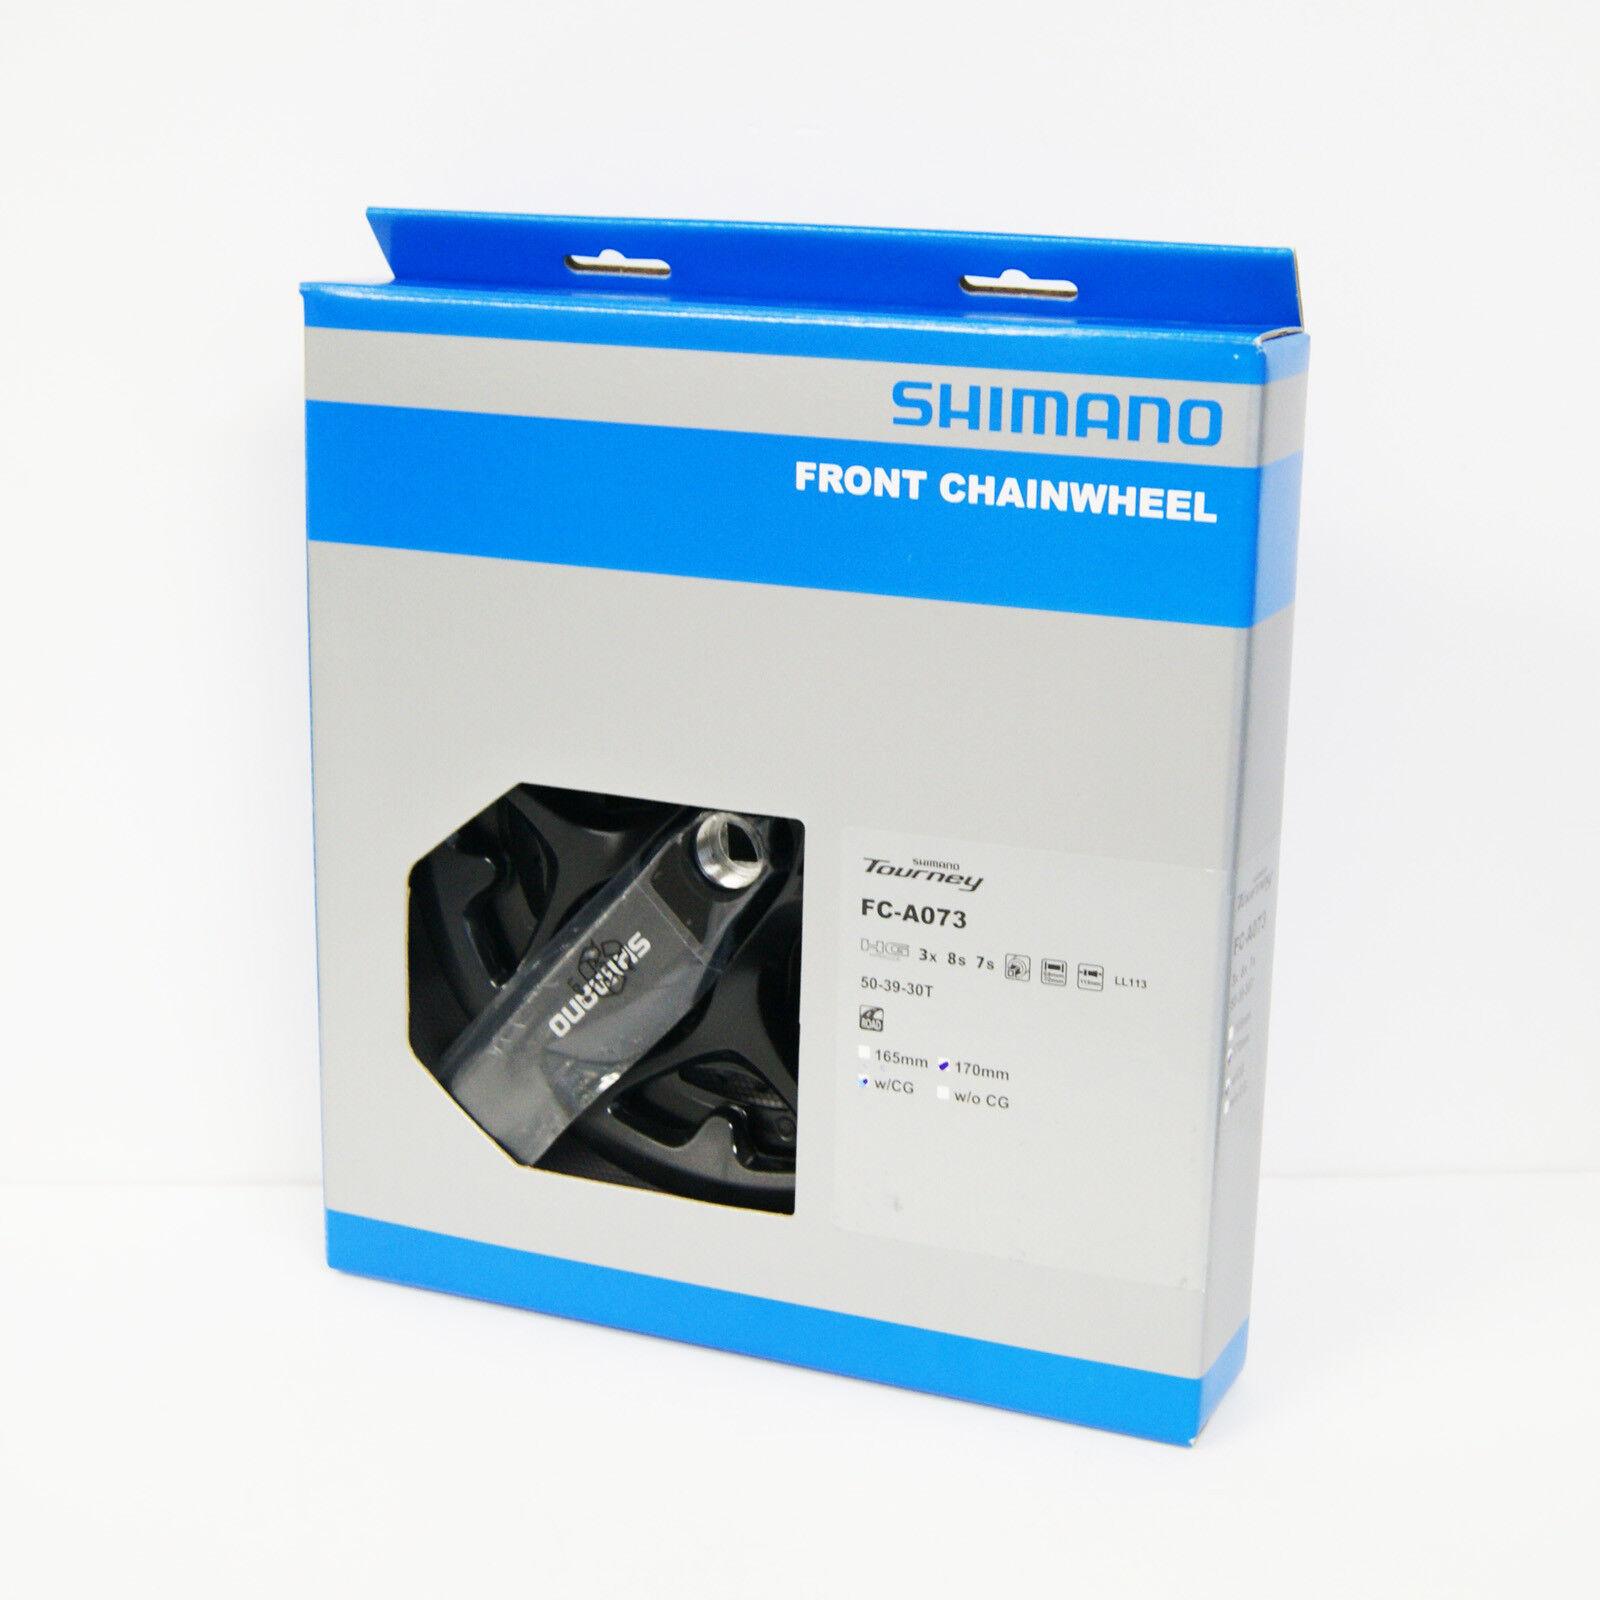 Shimano Tourney FCA073 503930T 170mm Crankset w Chainguard EFCA073C090C